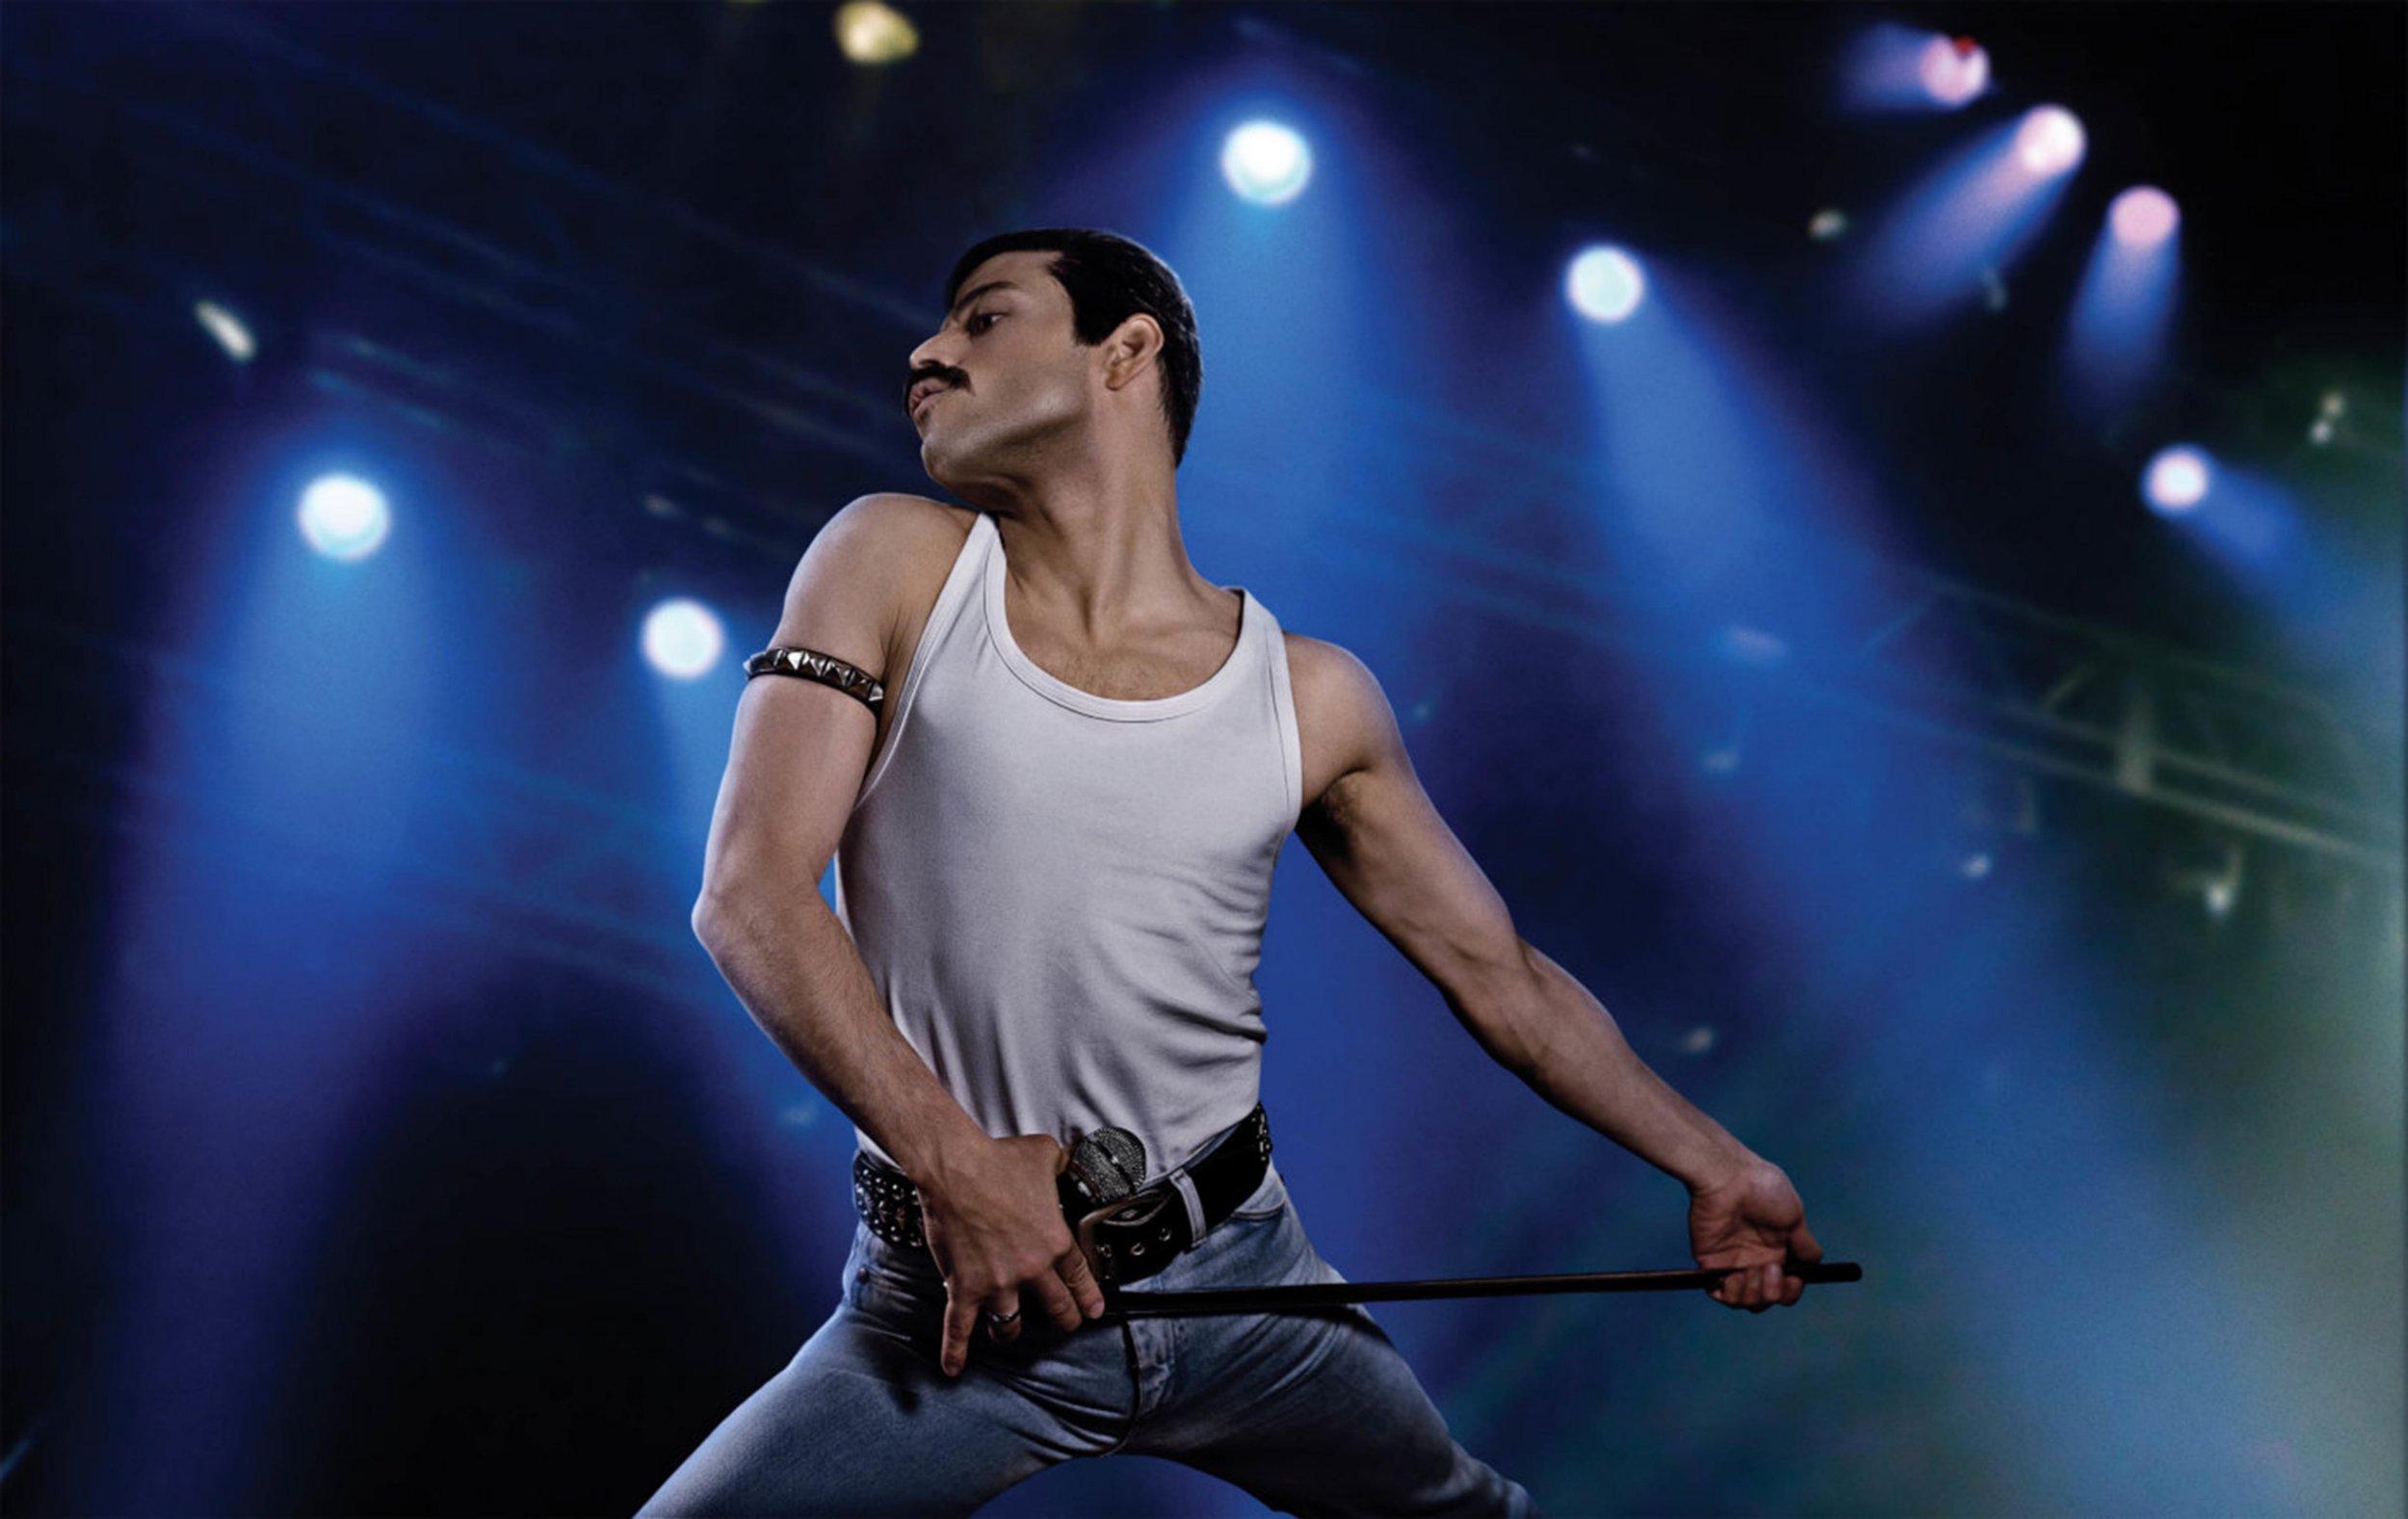 Rami Malek as Freddie Mercury in Bohemian Rhapsody - 2018